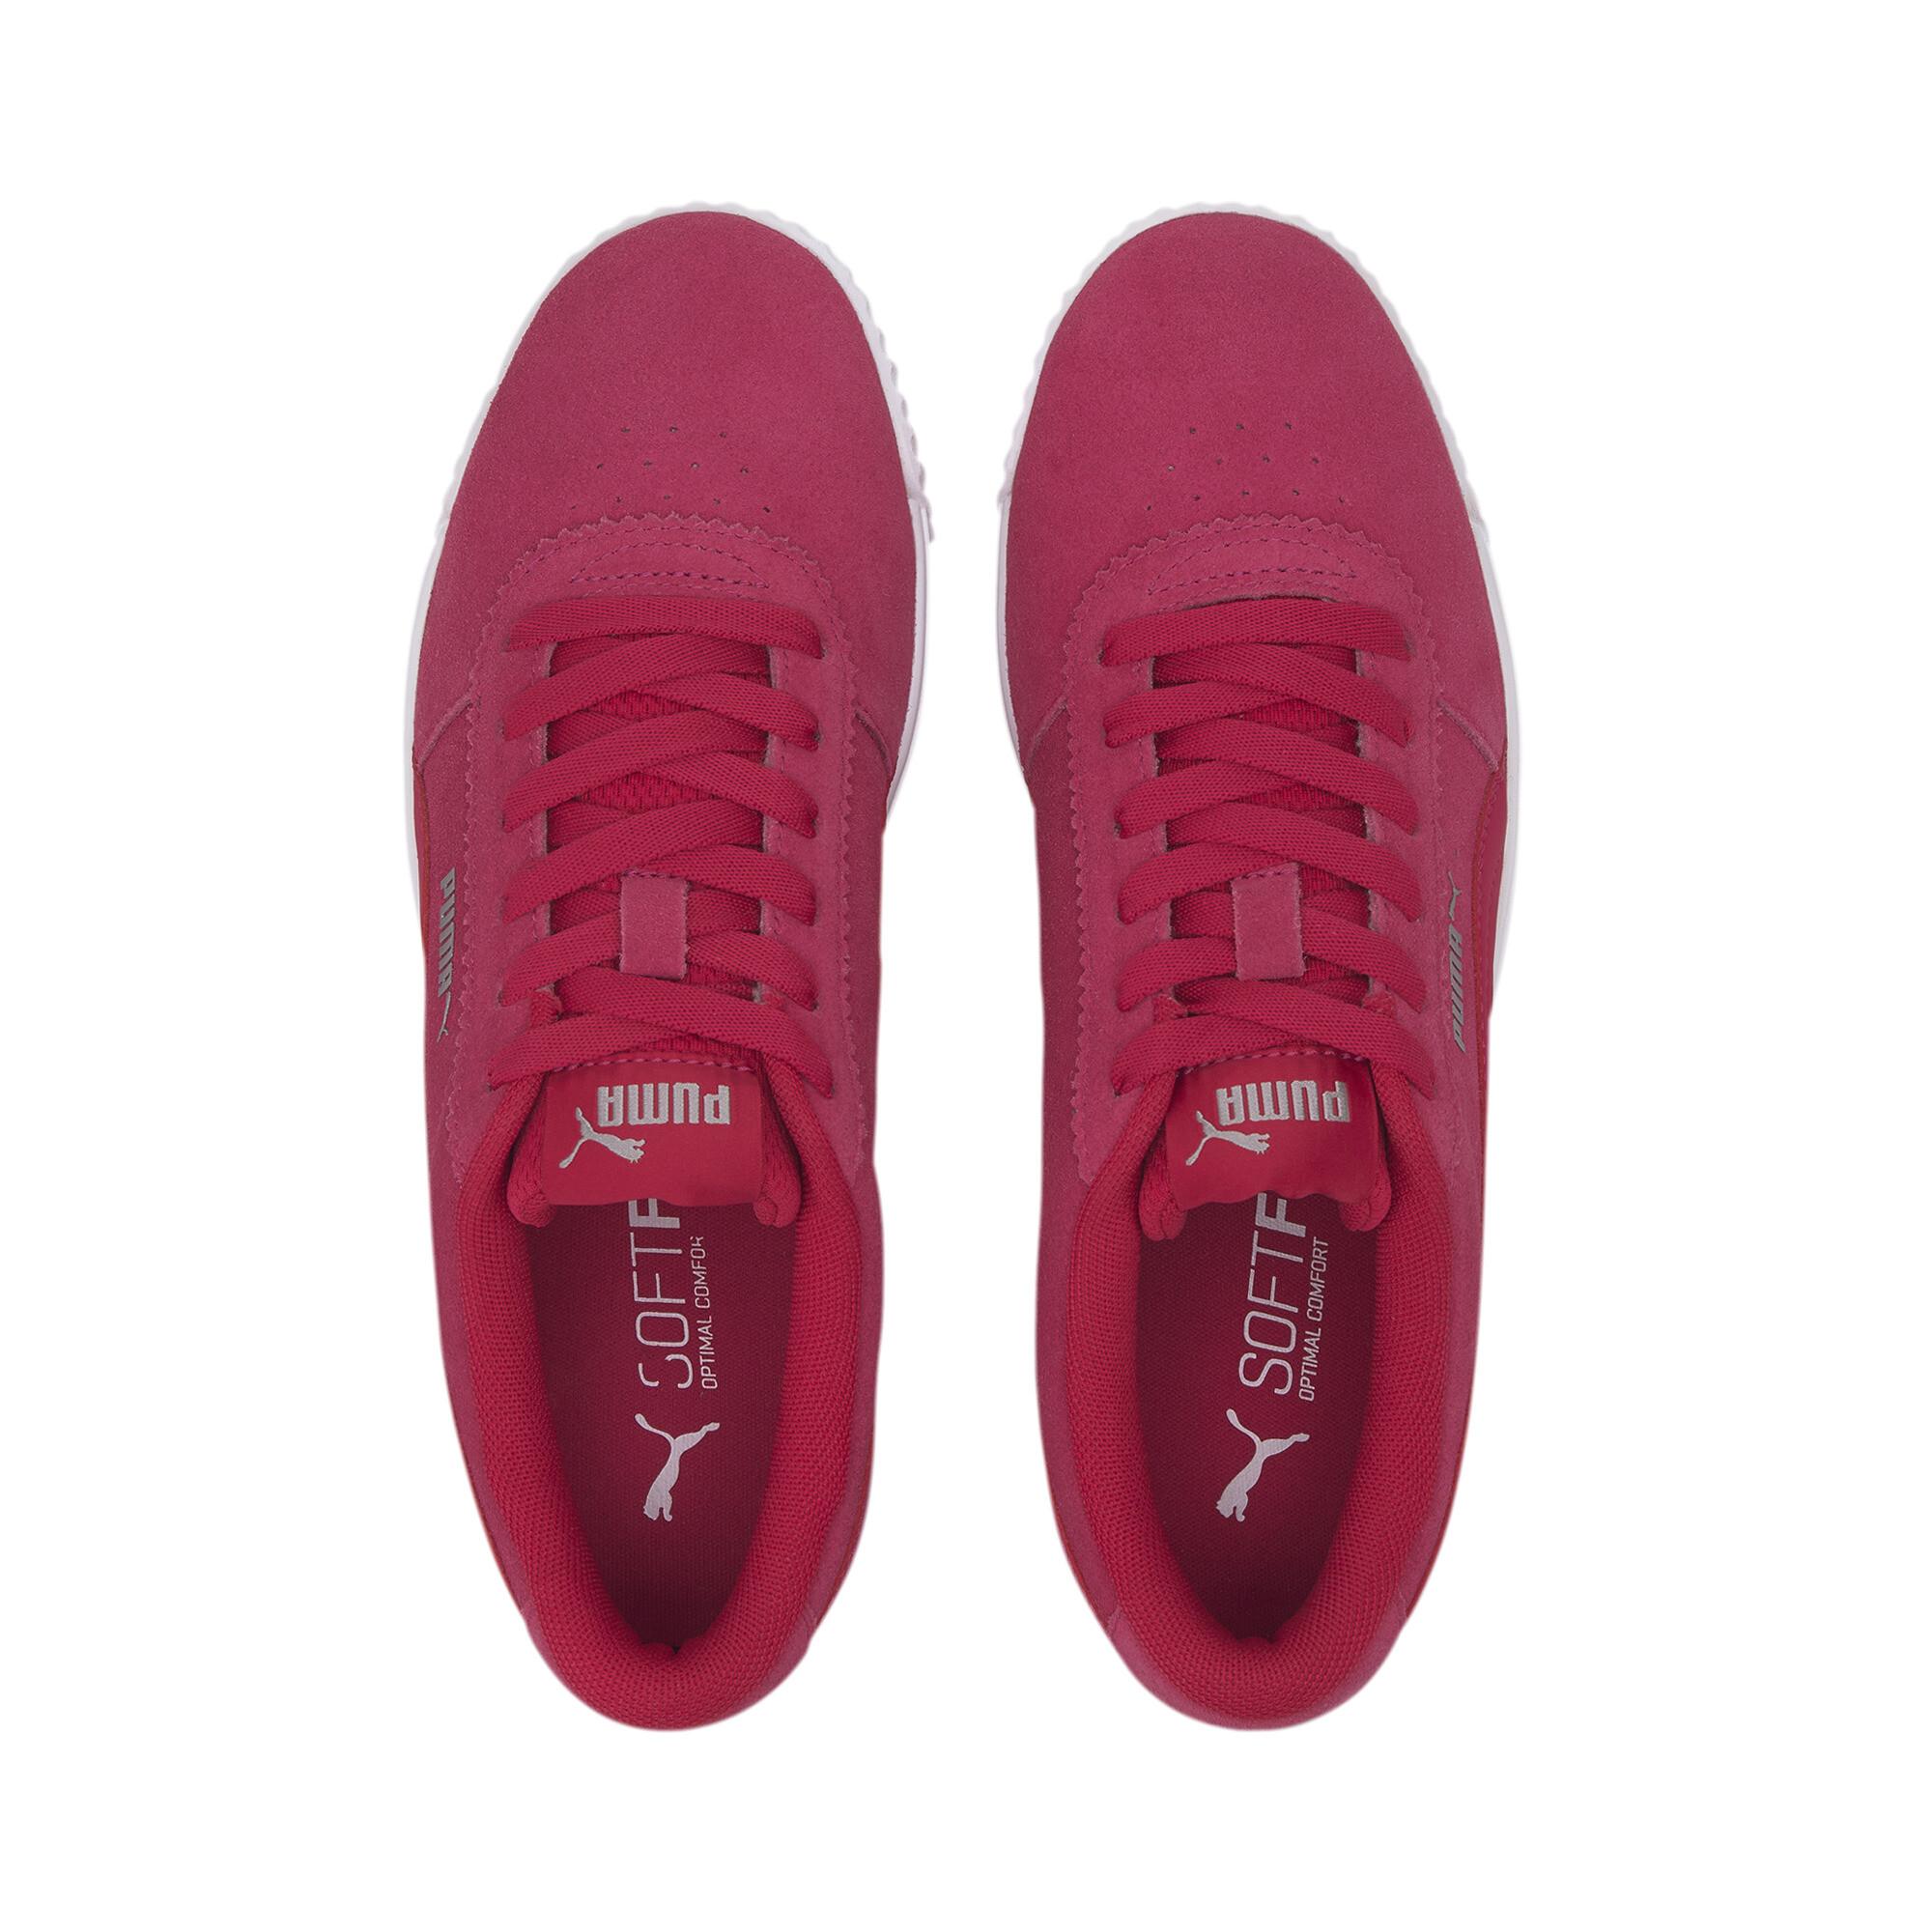 PUMA-Women-039-s-Carina-Slim-Suede-Sneakers thumbnail 15